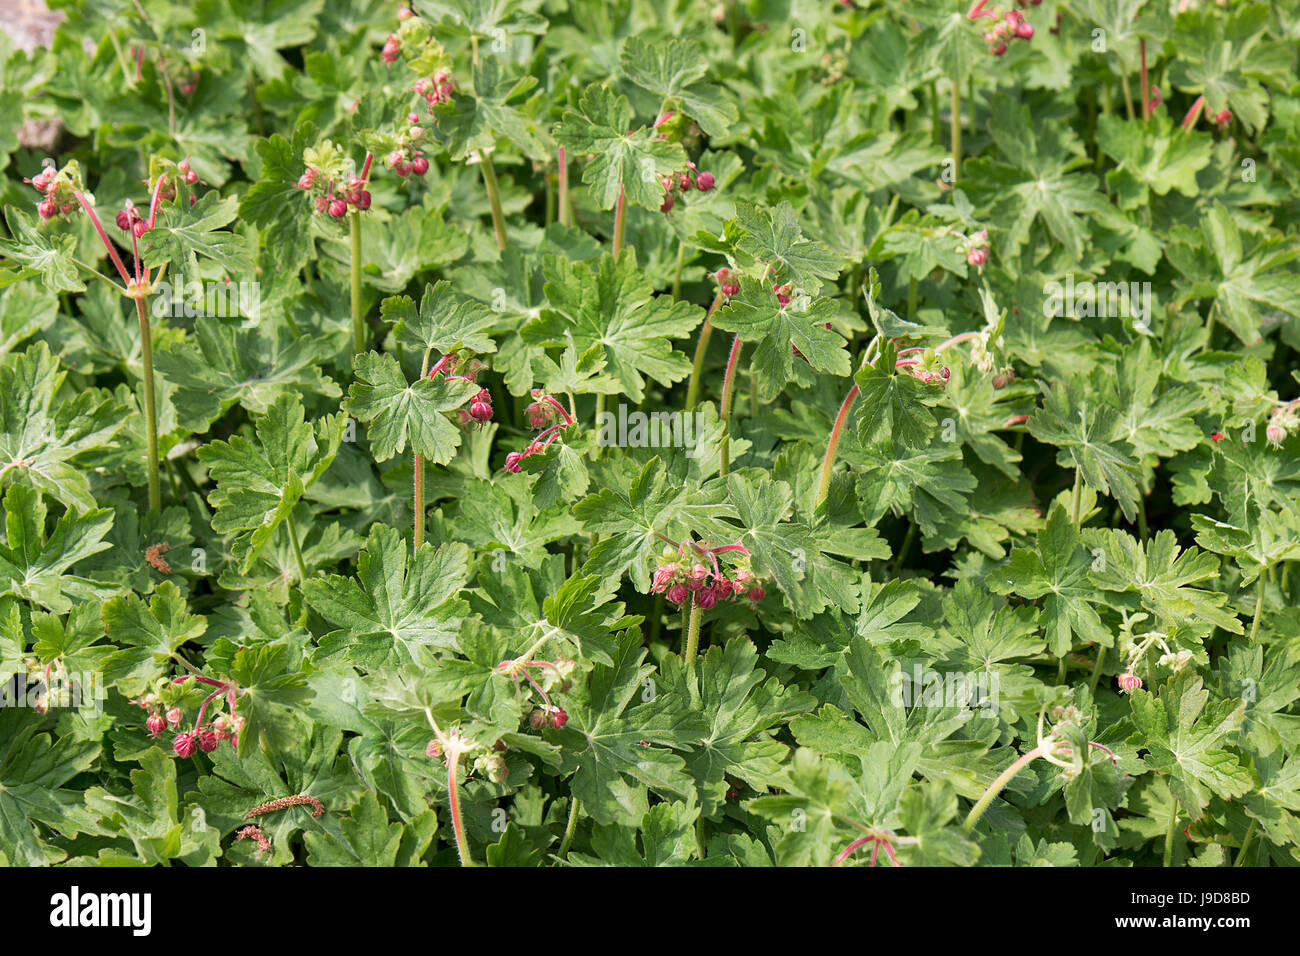 Rock Cranes-Bill, Hardy Geranium, Wild Geranium 'Czakor' (Geranium macrorrhizum), bigroot - Stock Image